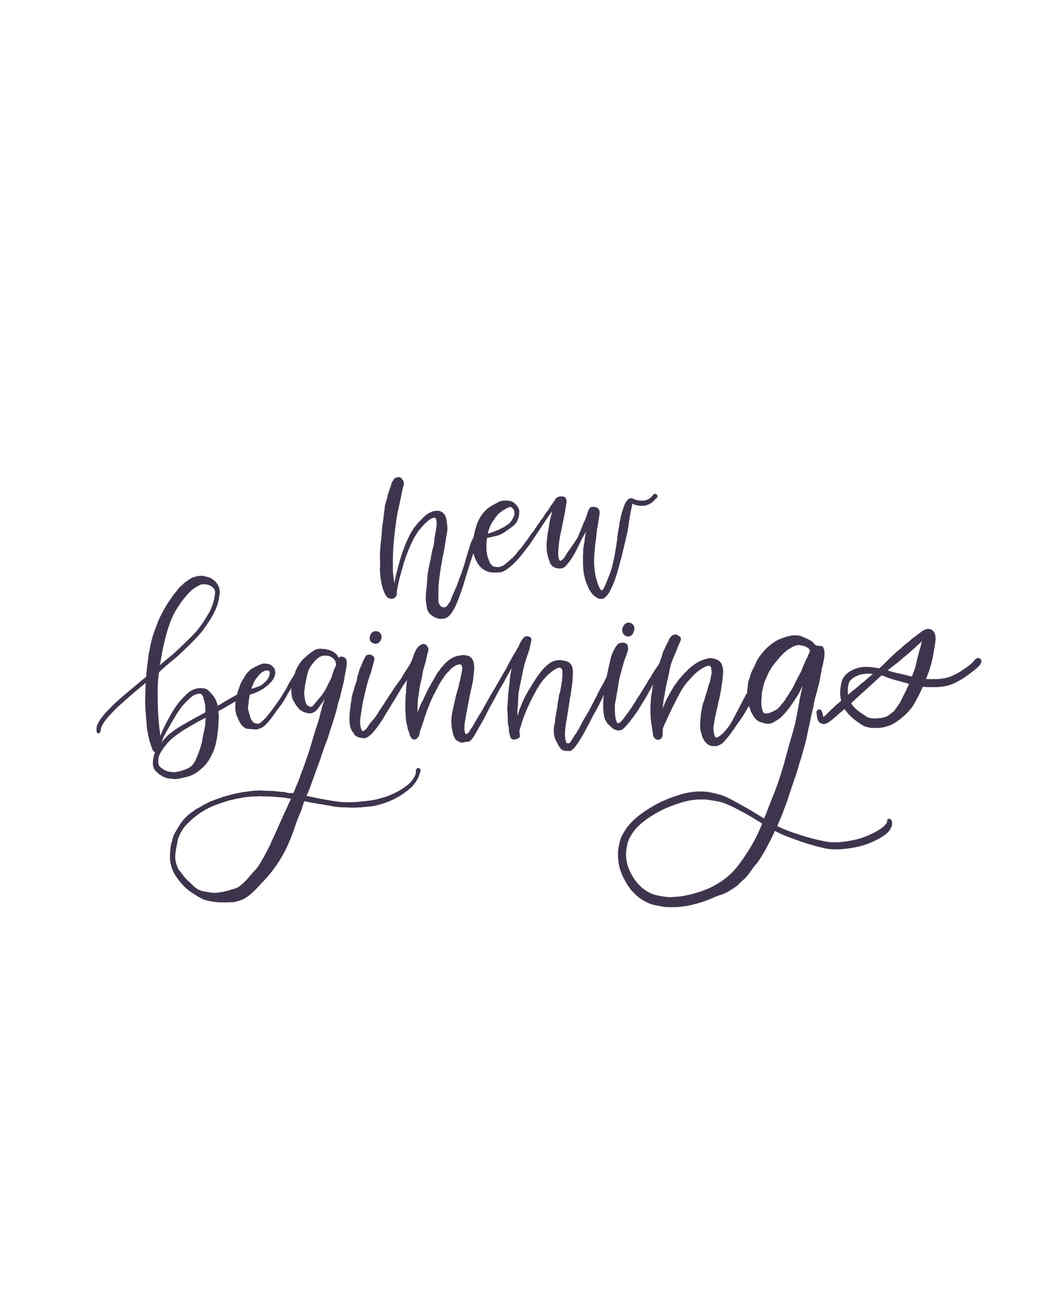 """new beginnings"" calligraphy"